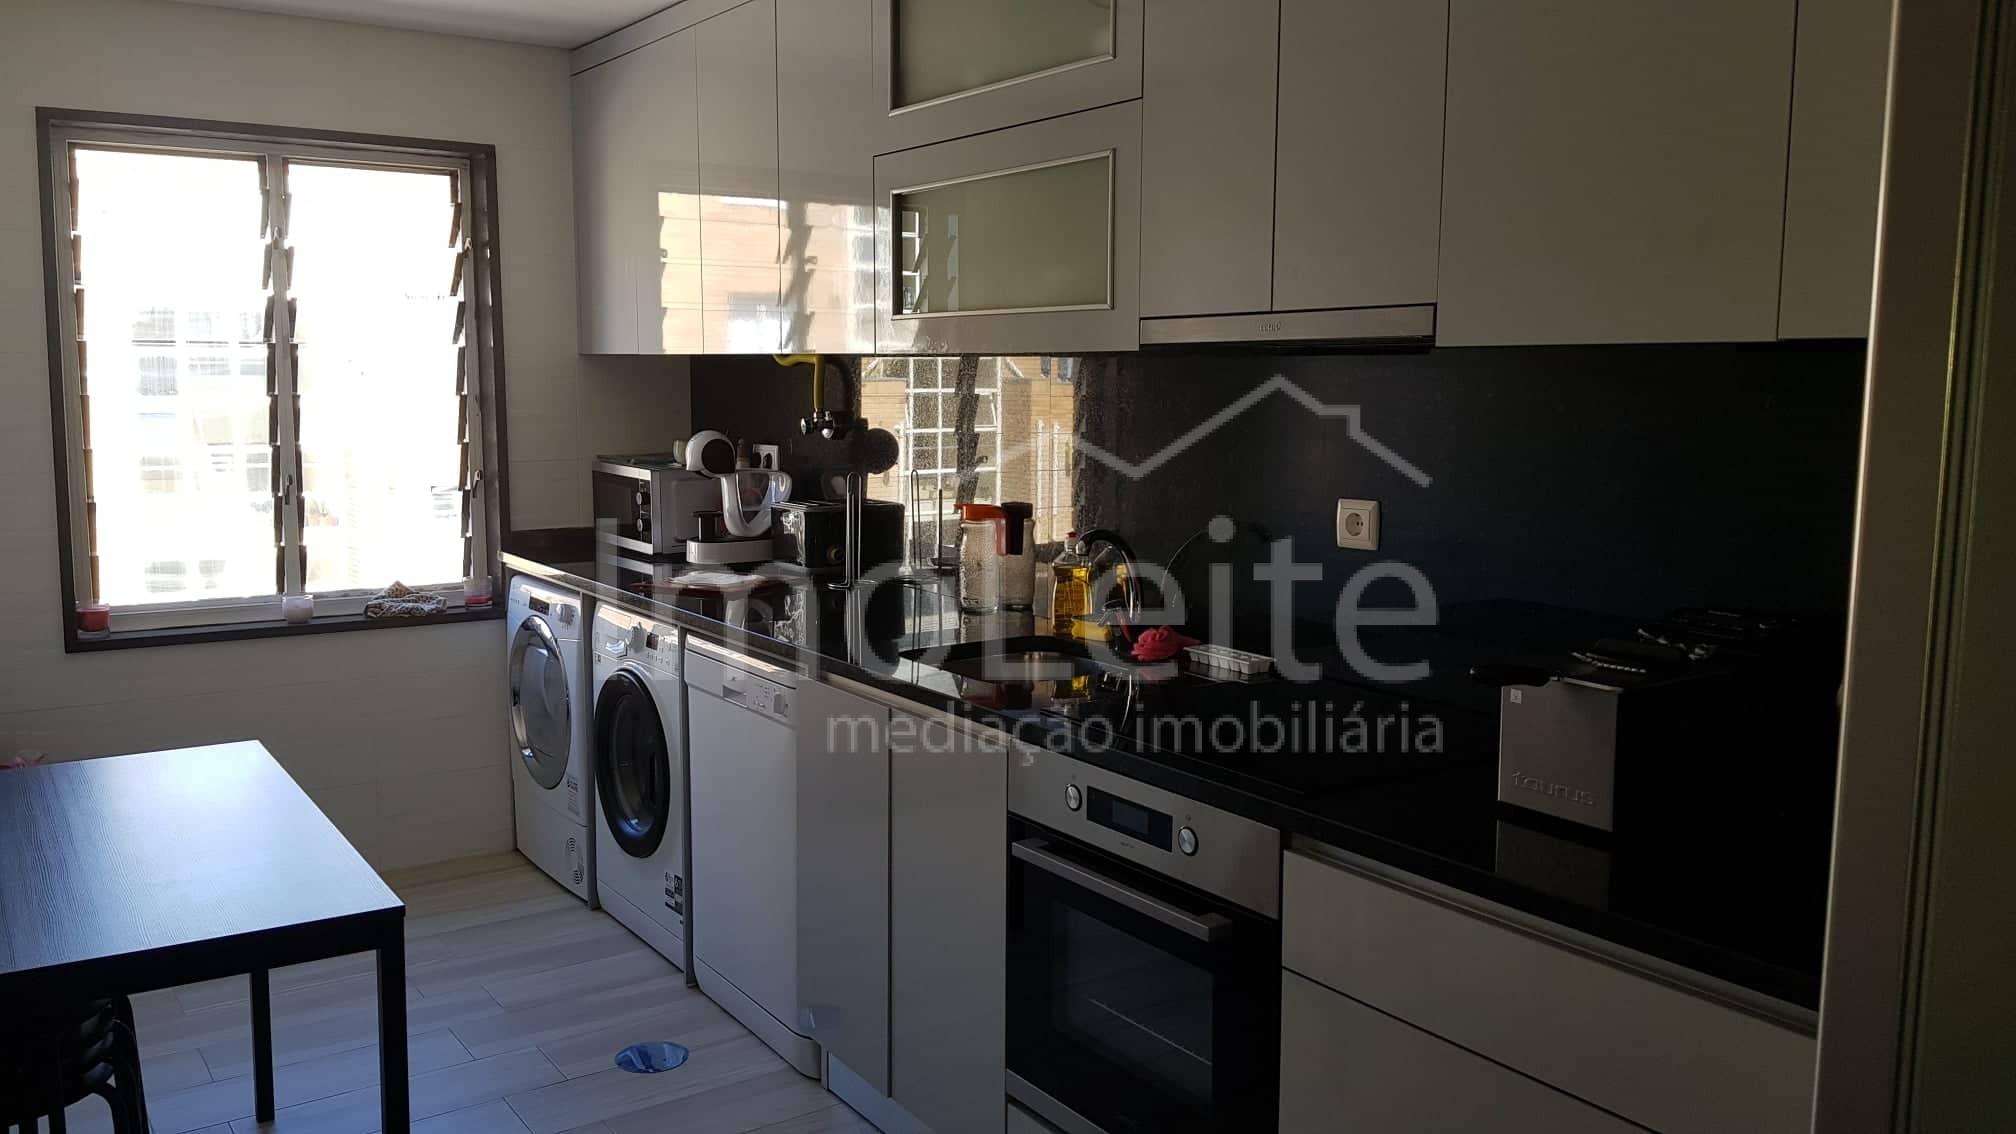 Apartamento T3 Póvoa de Varzim Argivai